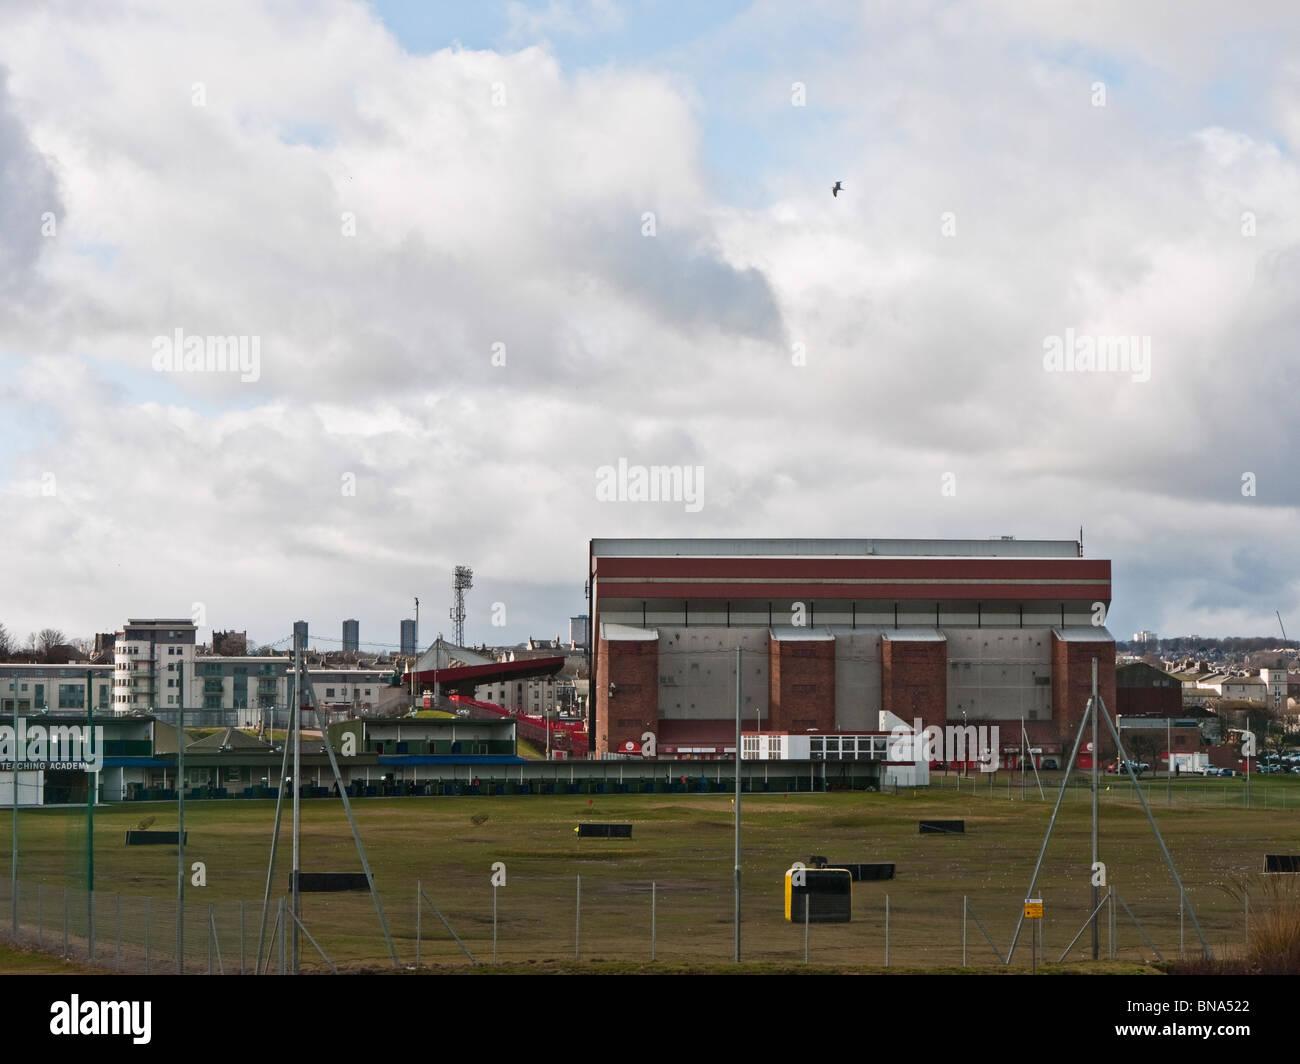 Pittodrie Stadium, home of Aberdeen Football Club, Aberdeen, Scotland, UK - Stock Image